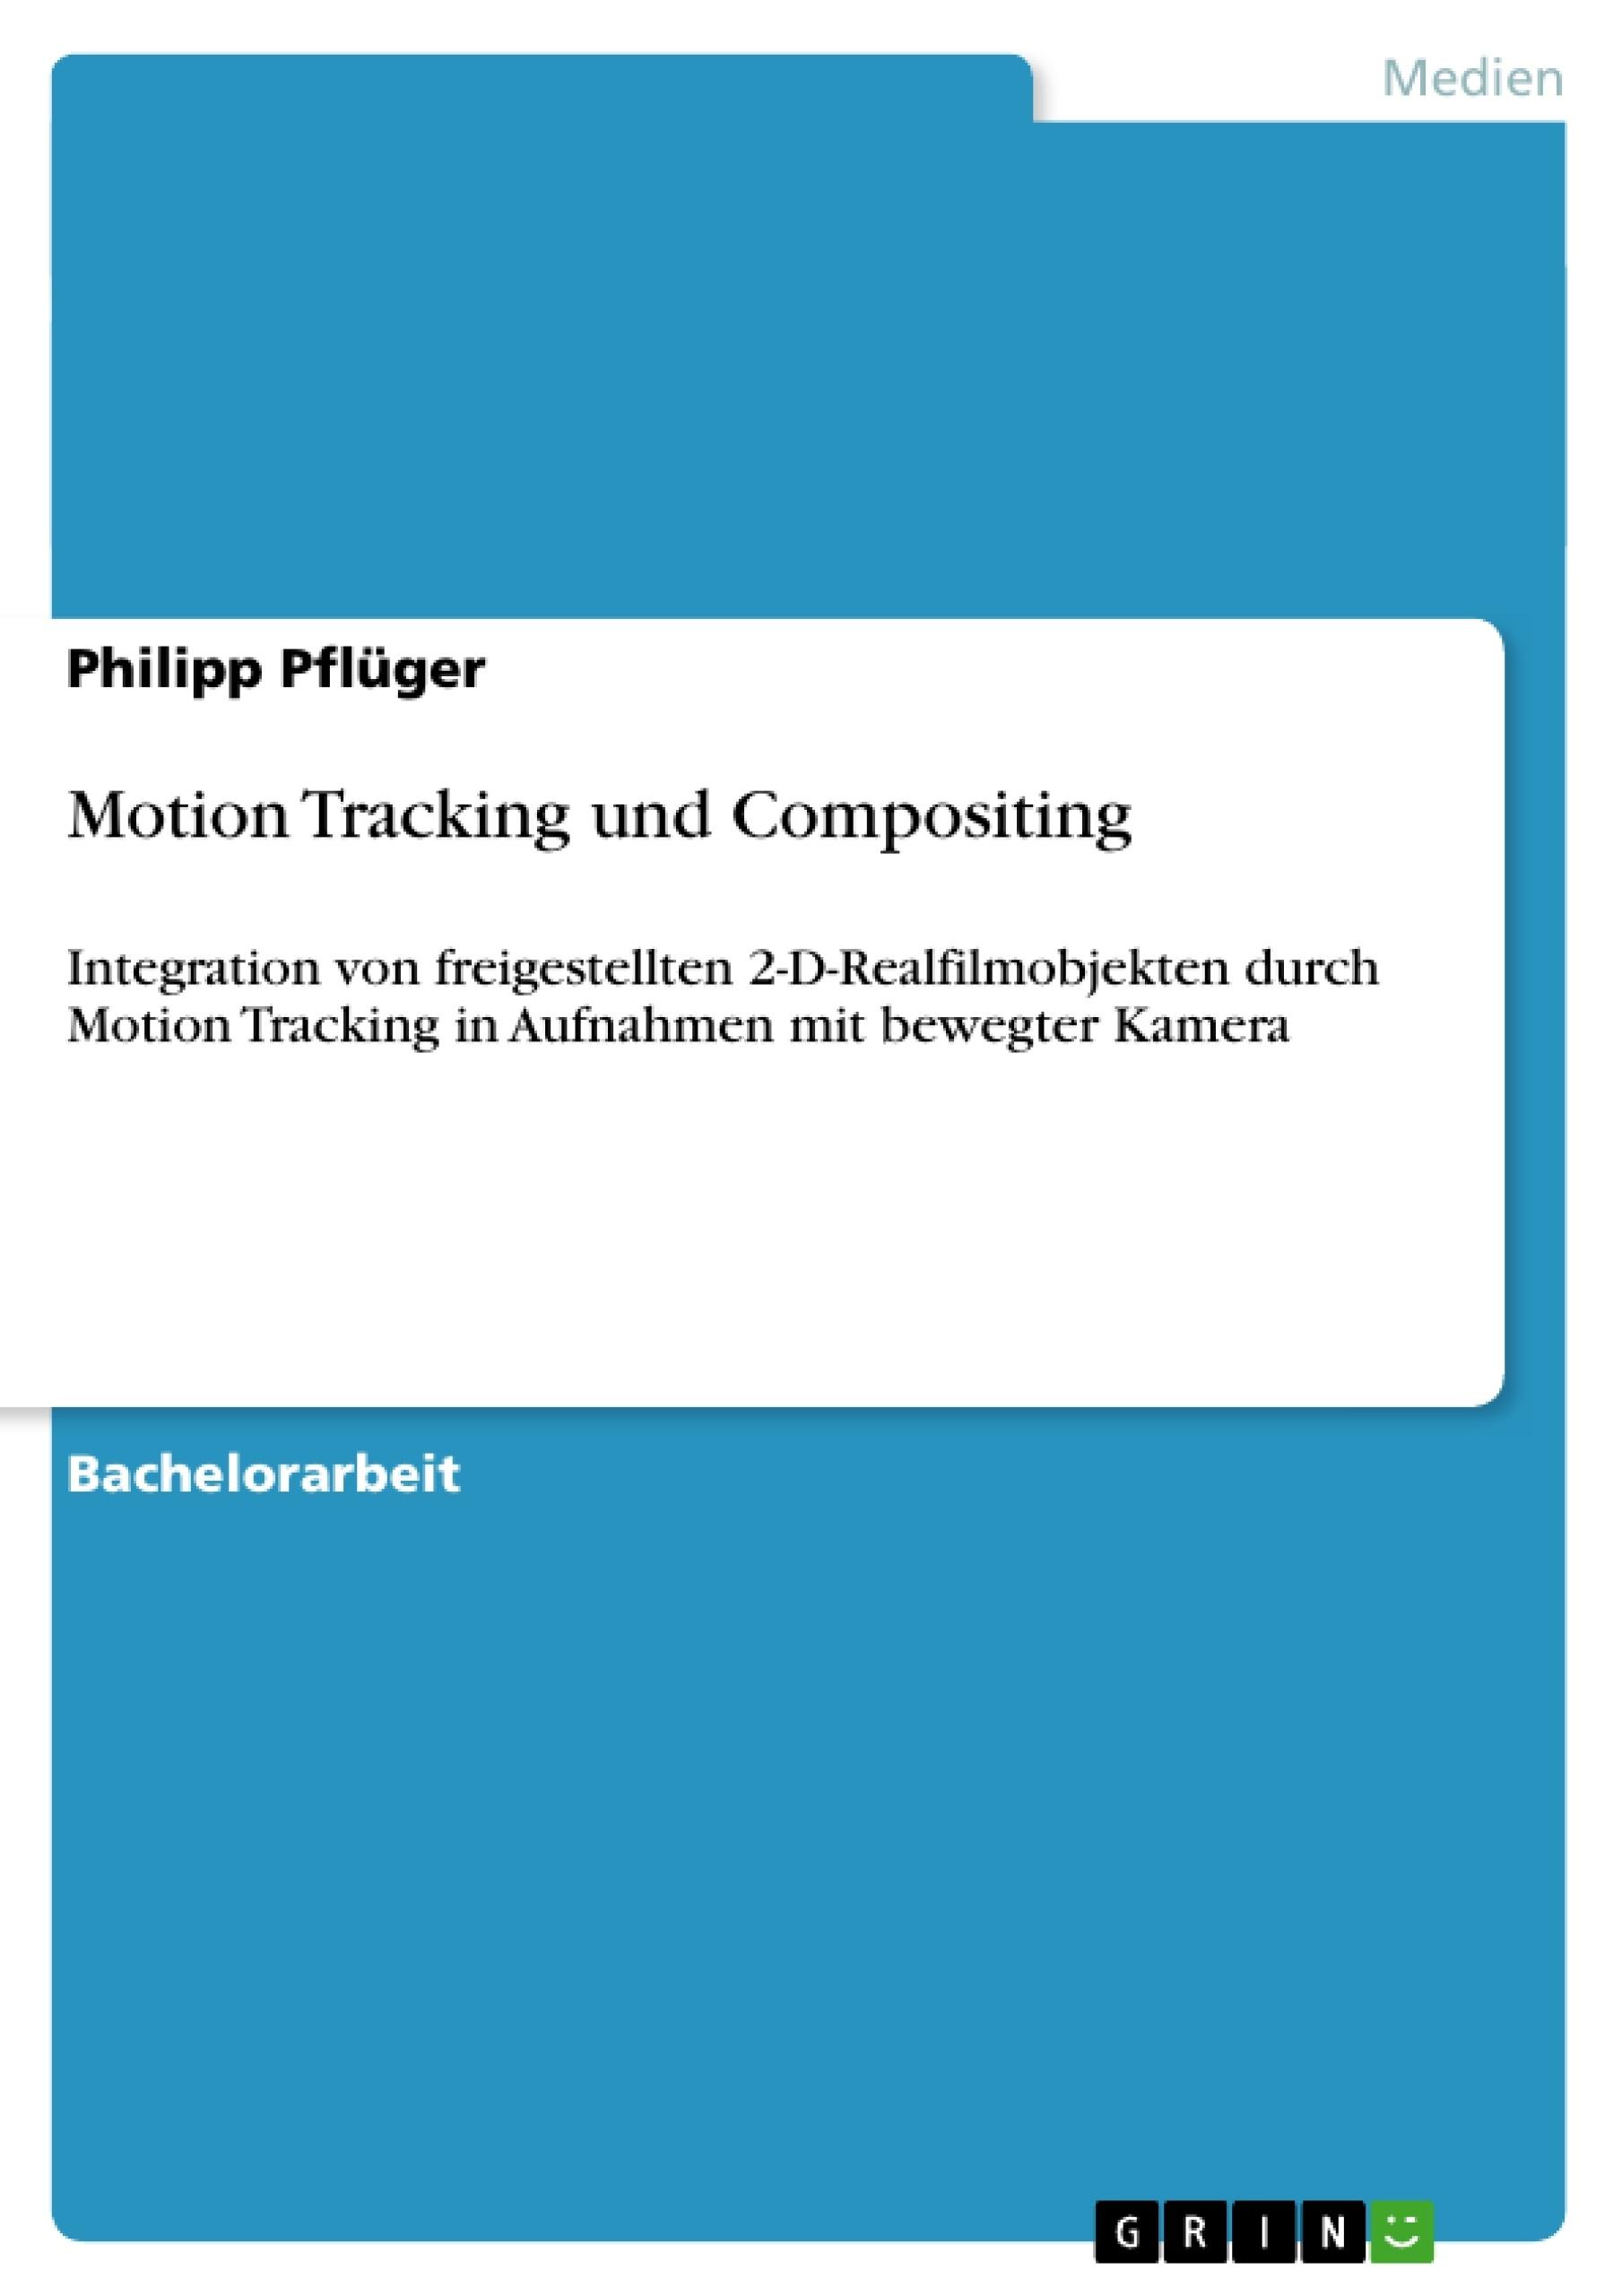 Titel: Motion Tracking und Compositing